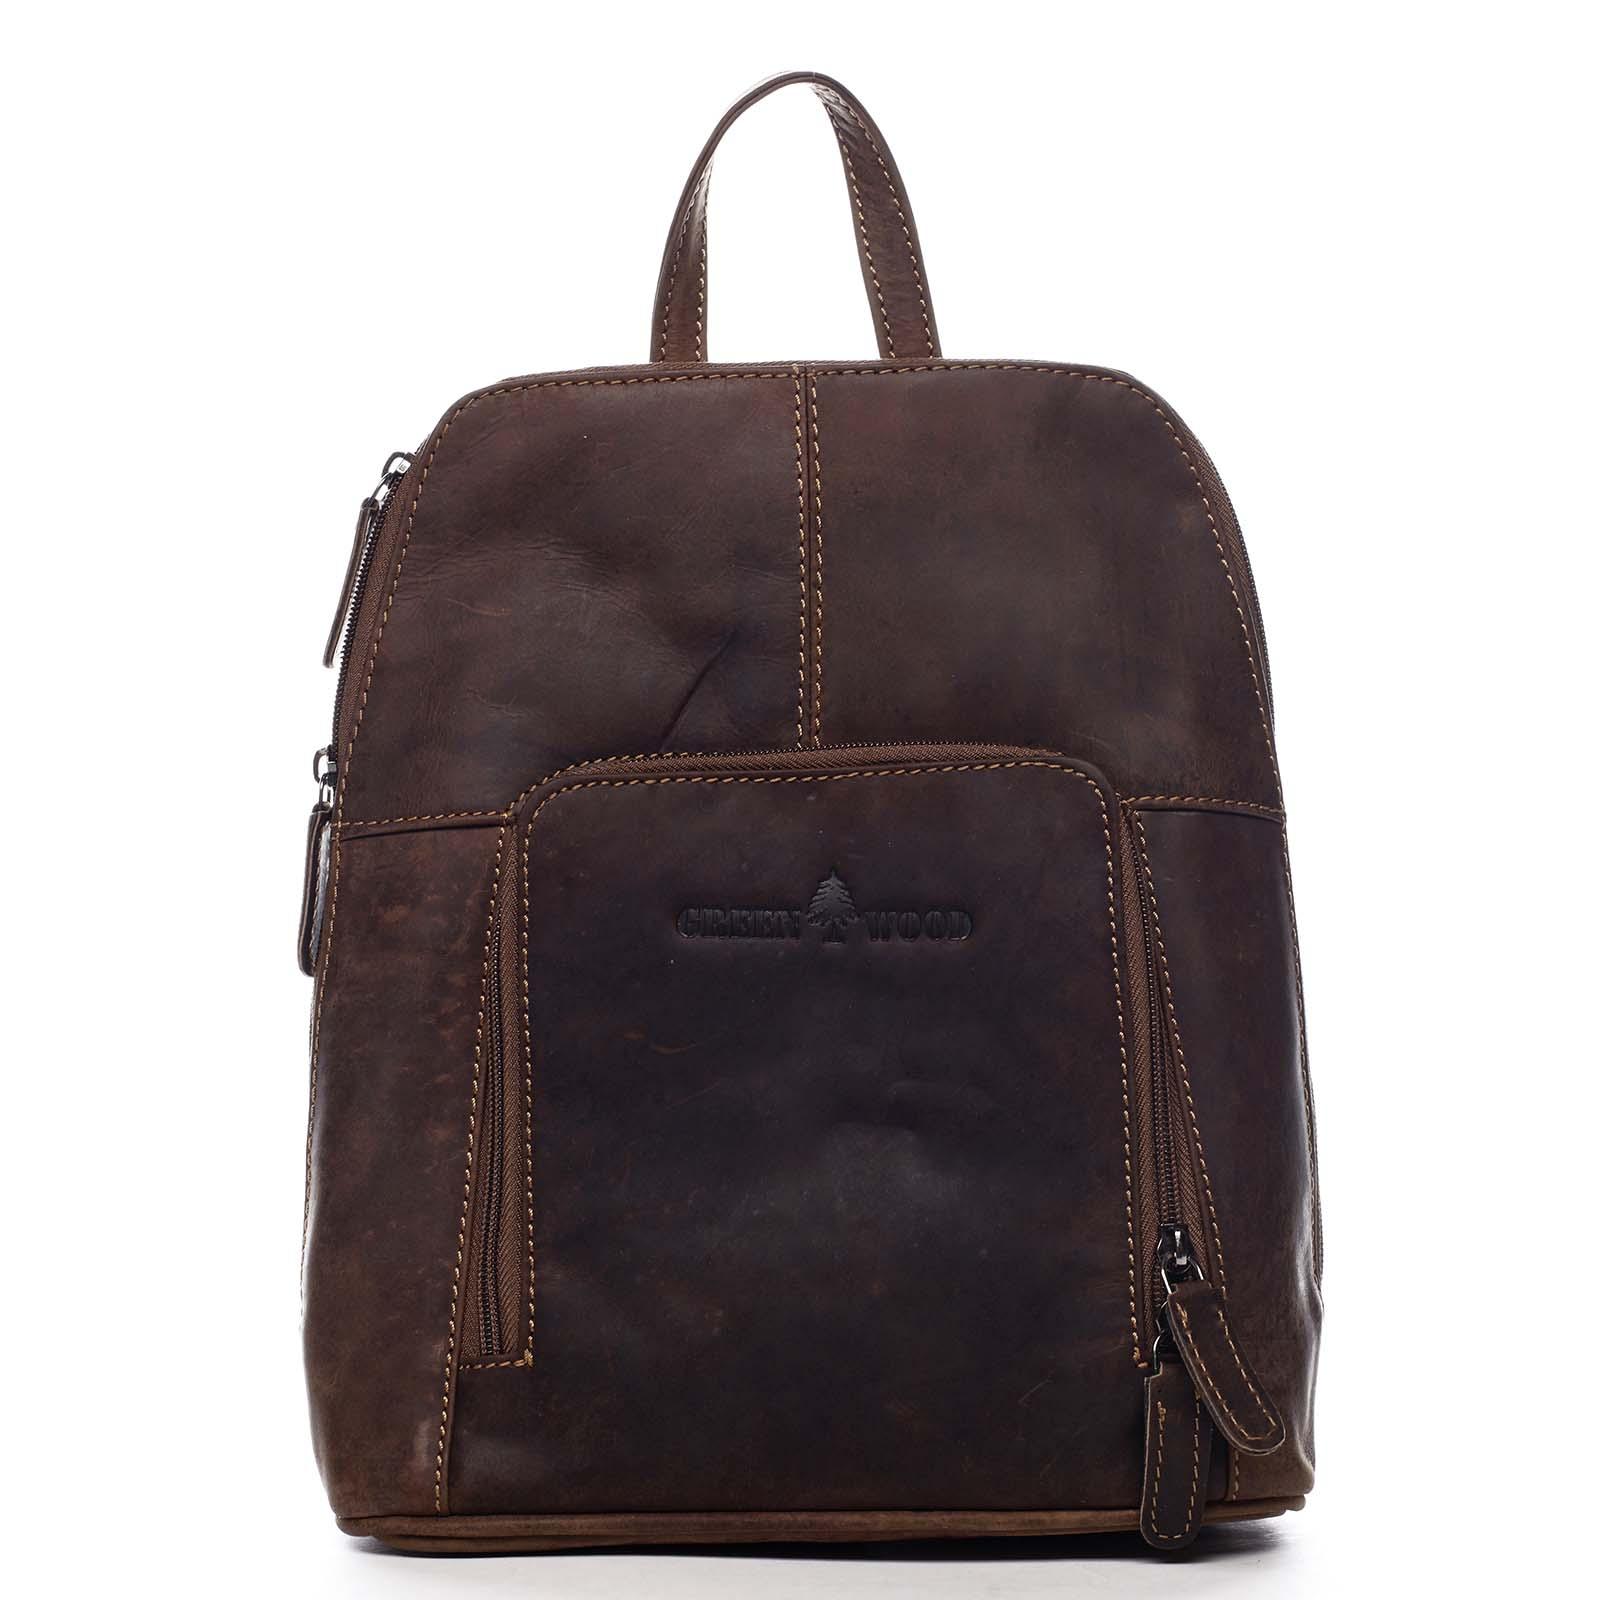 Dámsky kožený batôžtek hnedý - Greenwood Hammon